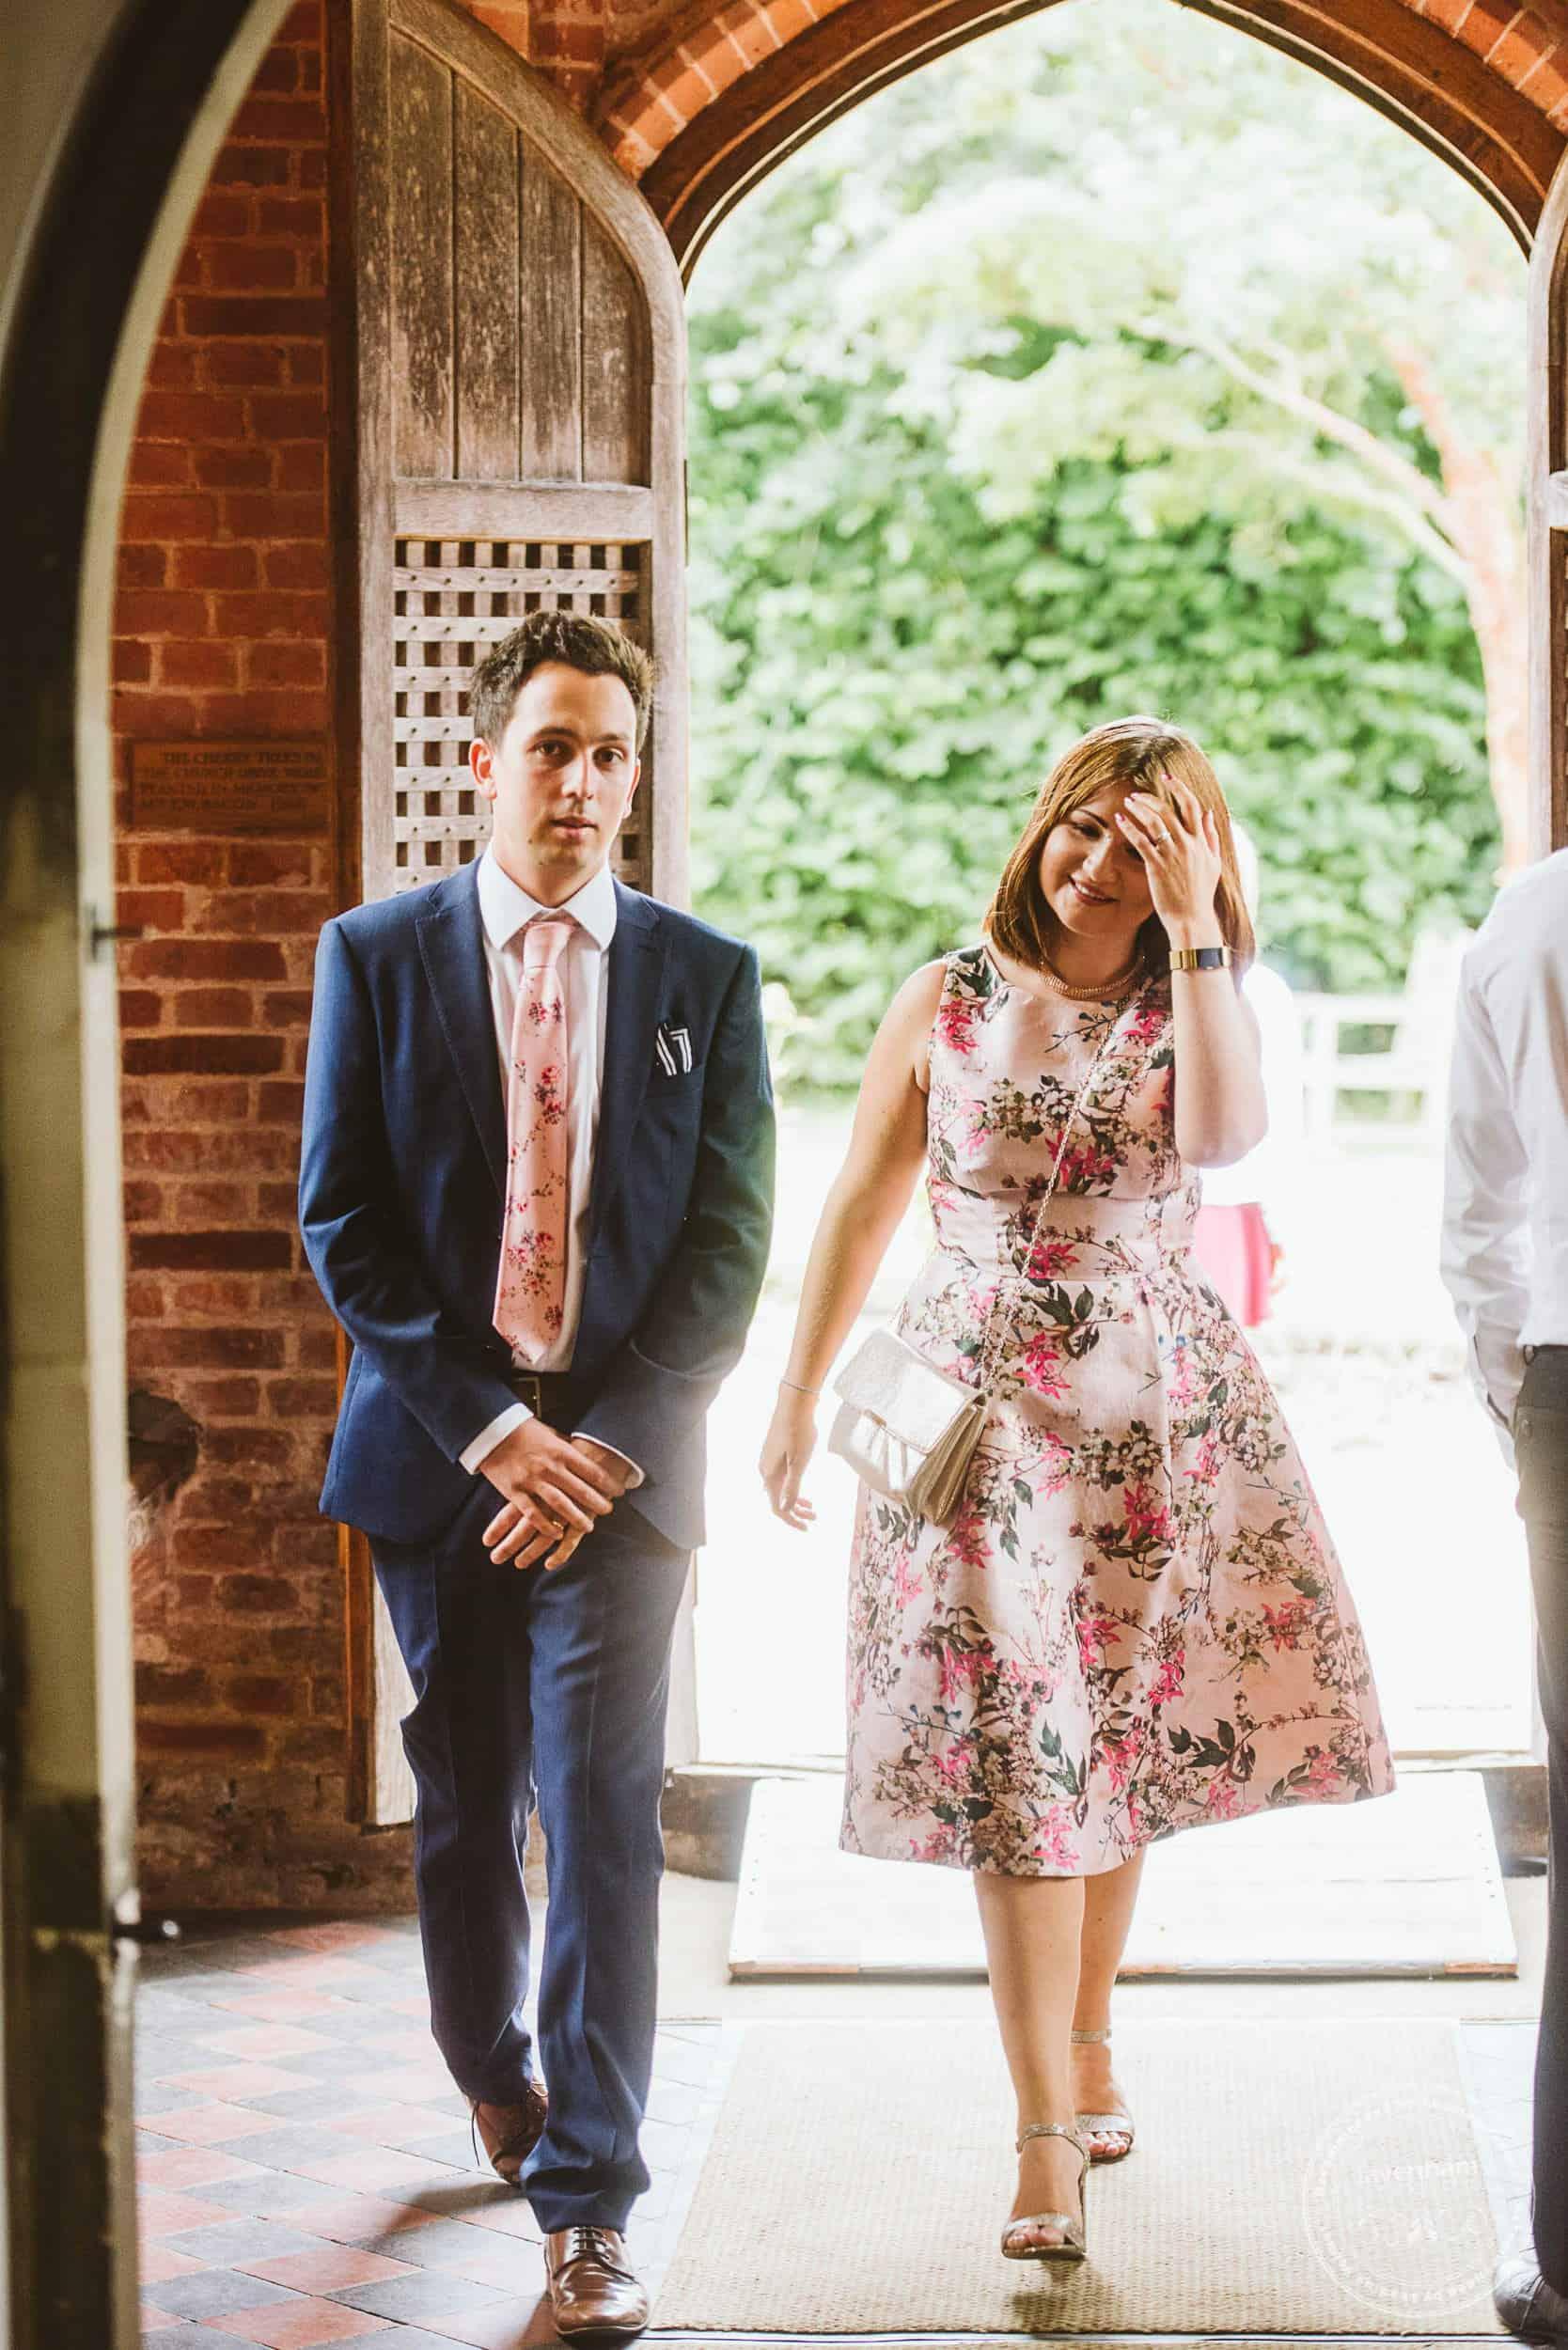 180818 Marks Hall Wedding Photography Lavenham Photographic 027